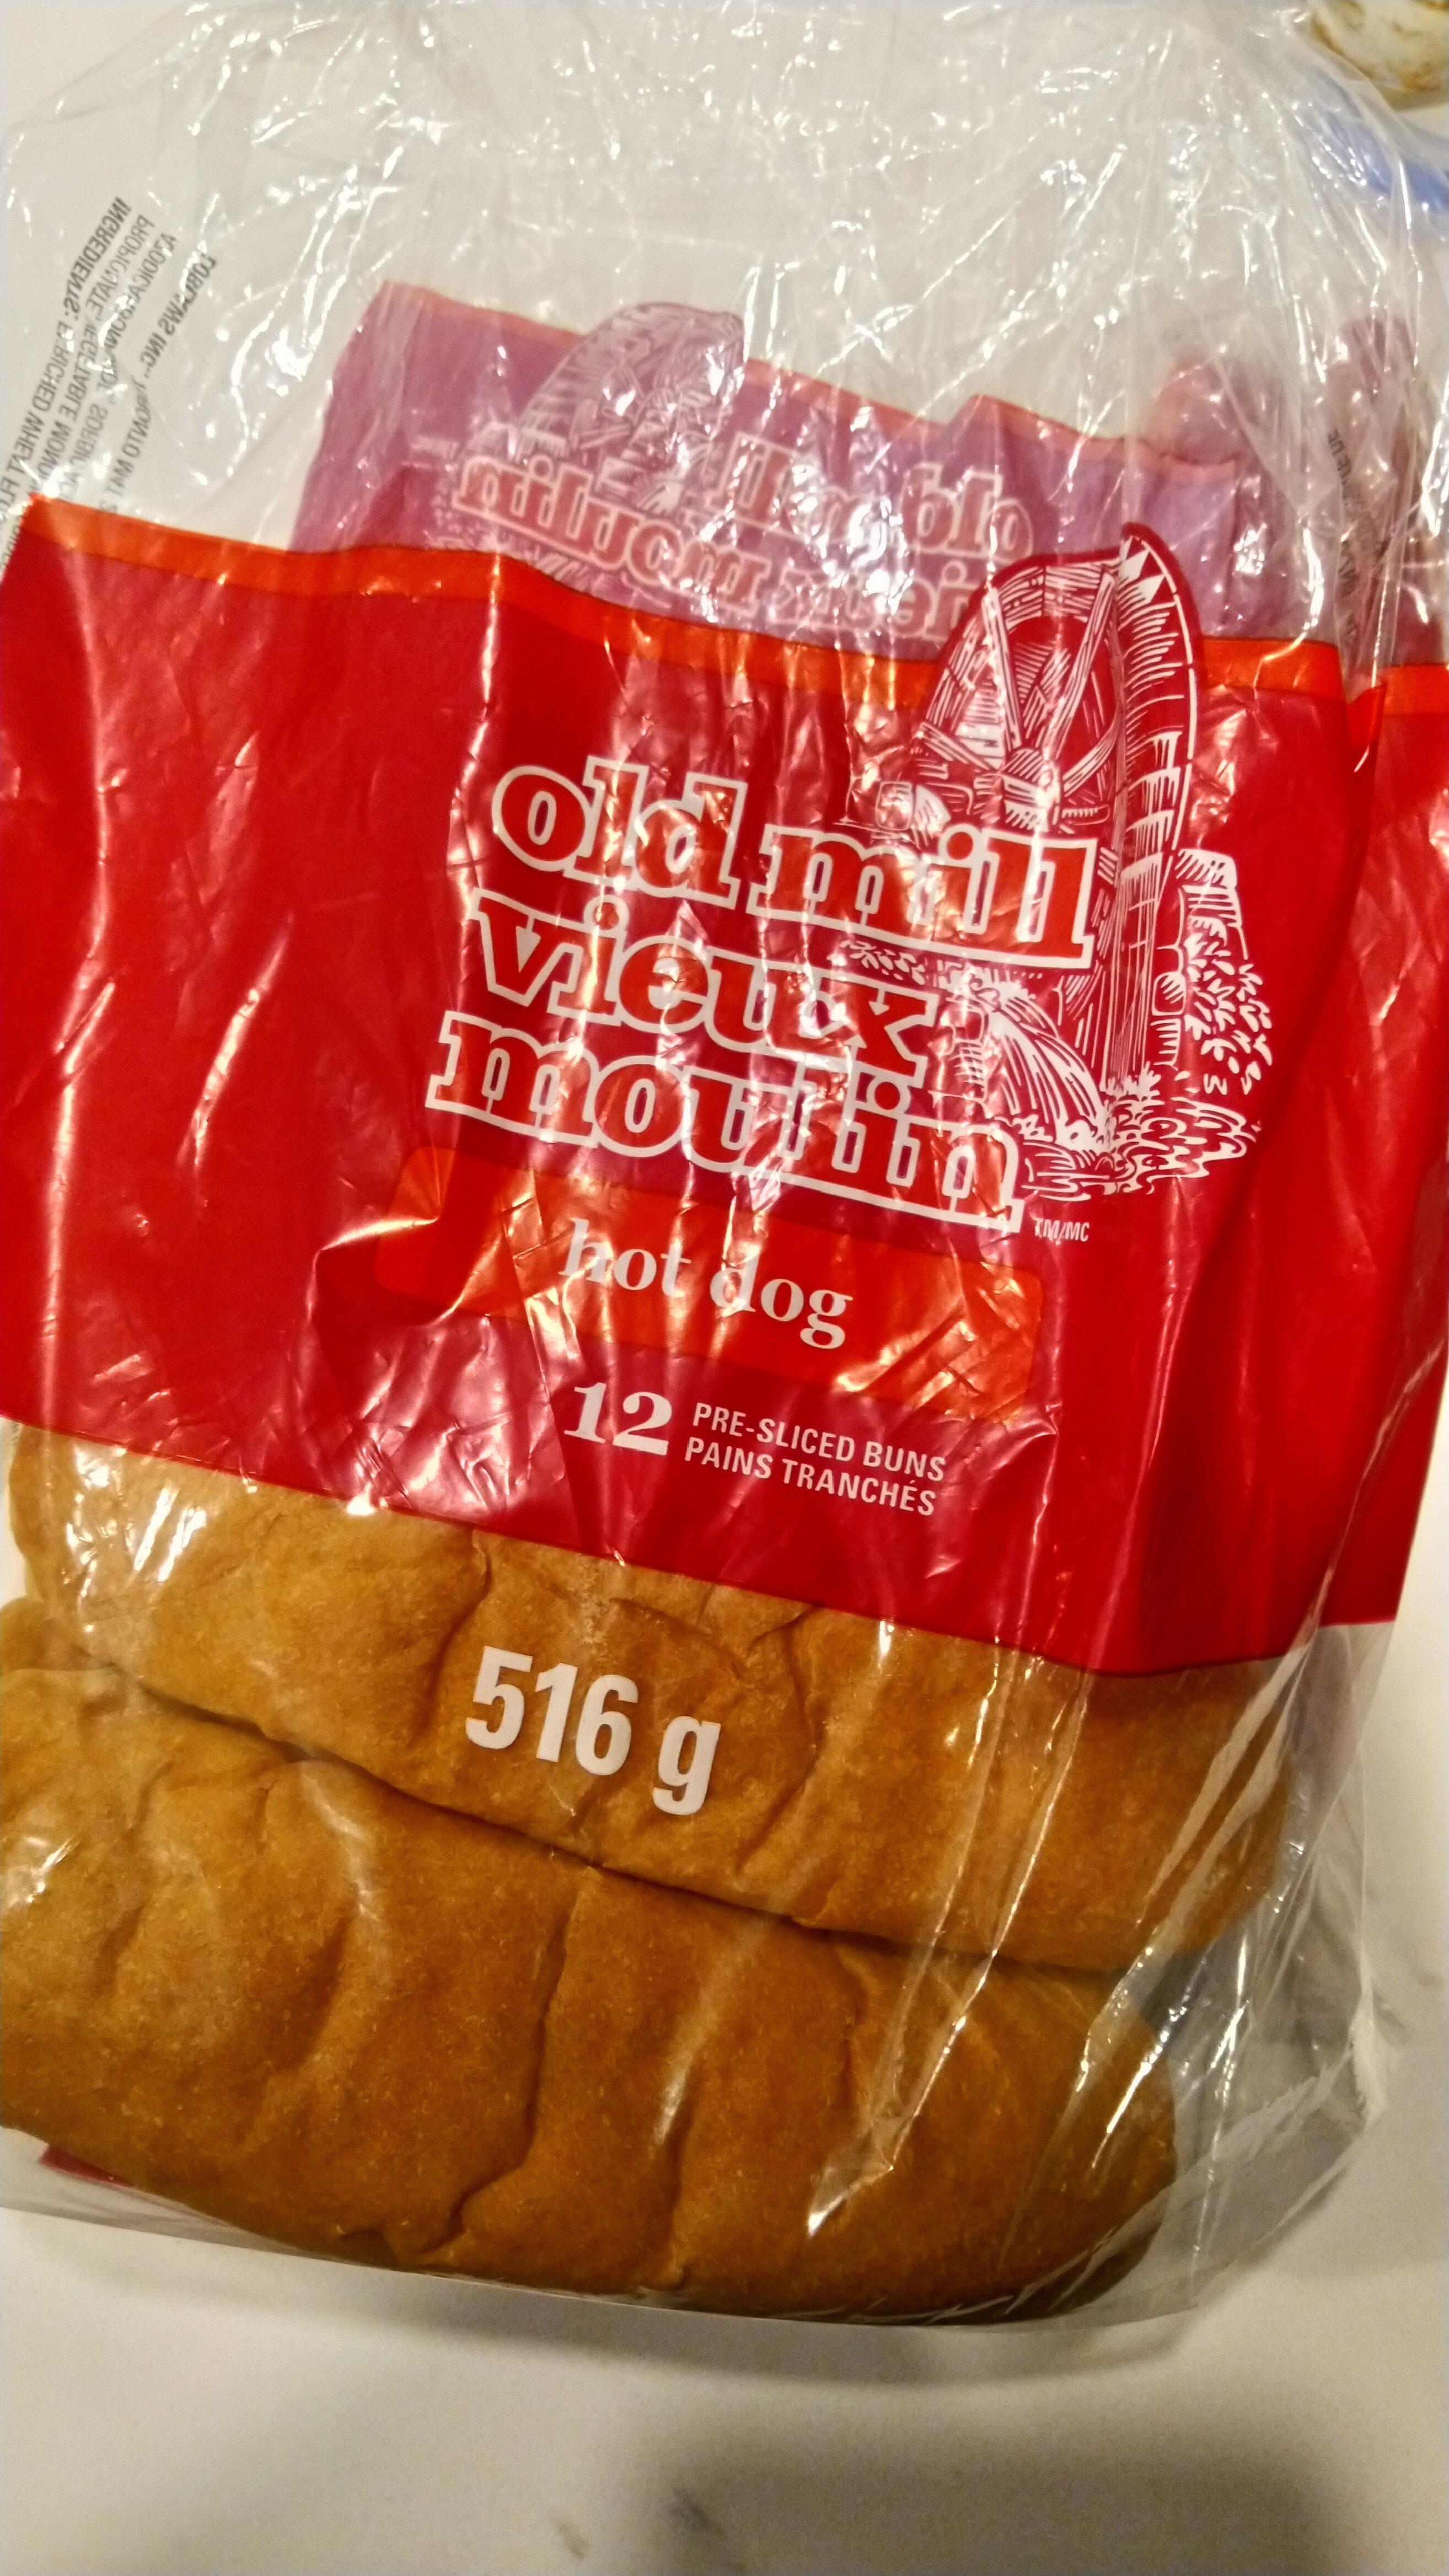 Hot Dog Buns - Produit - en